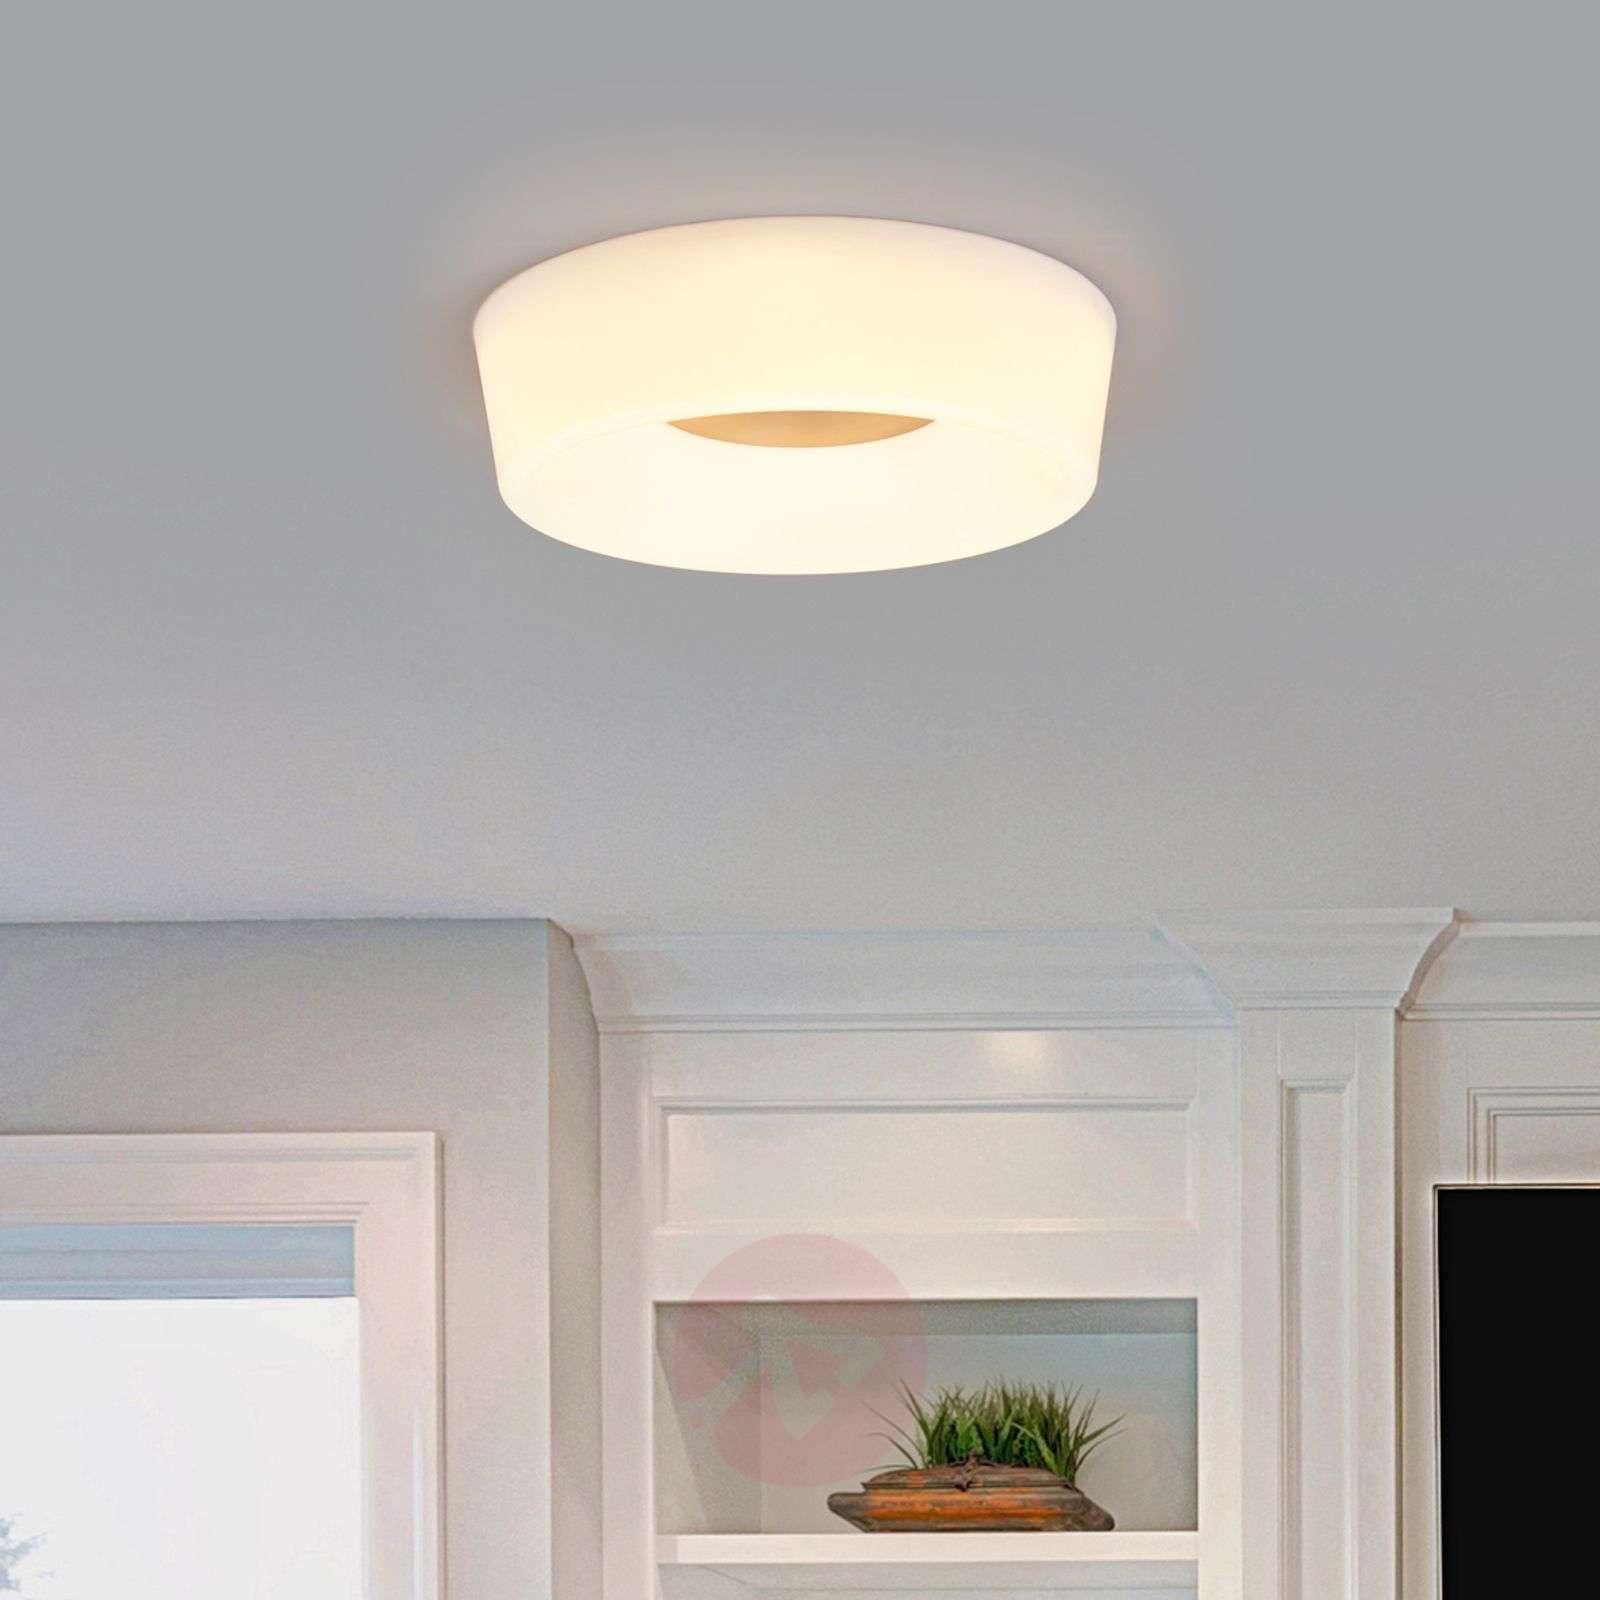 Round LED Ceiling Light Carl-1050093-01